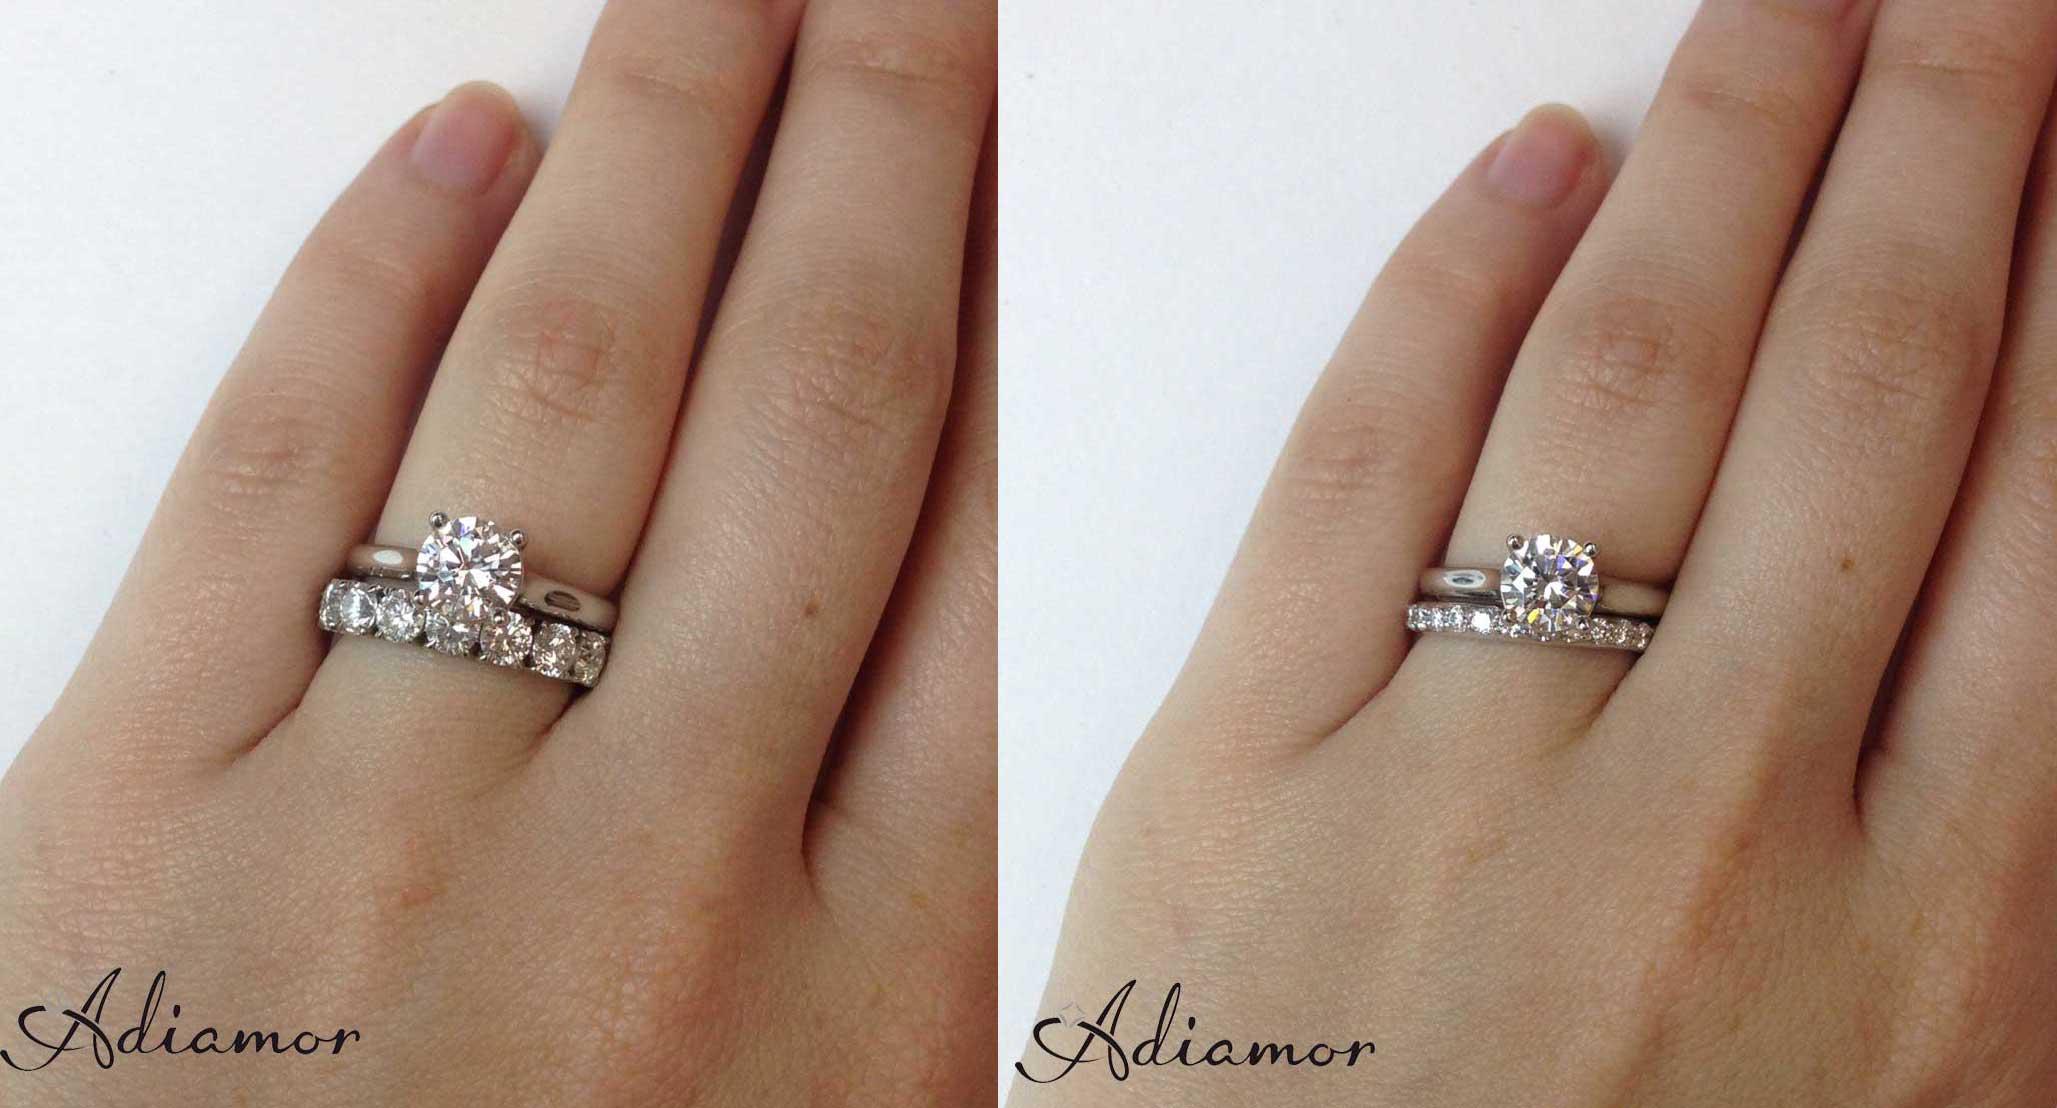 How To Wear Wedding Rings.How Do People Like To Wear Wedding Bands Adiamor